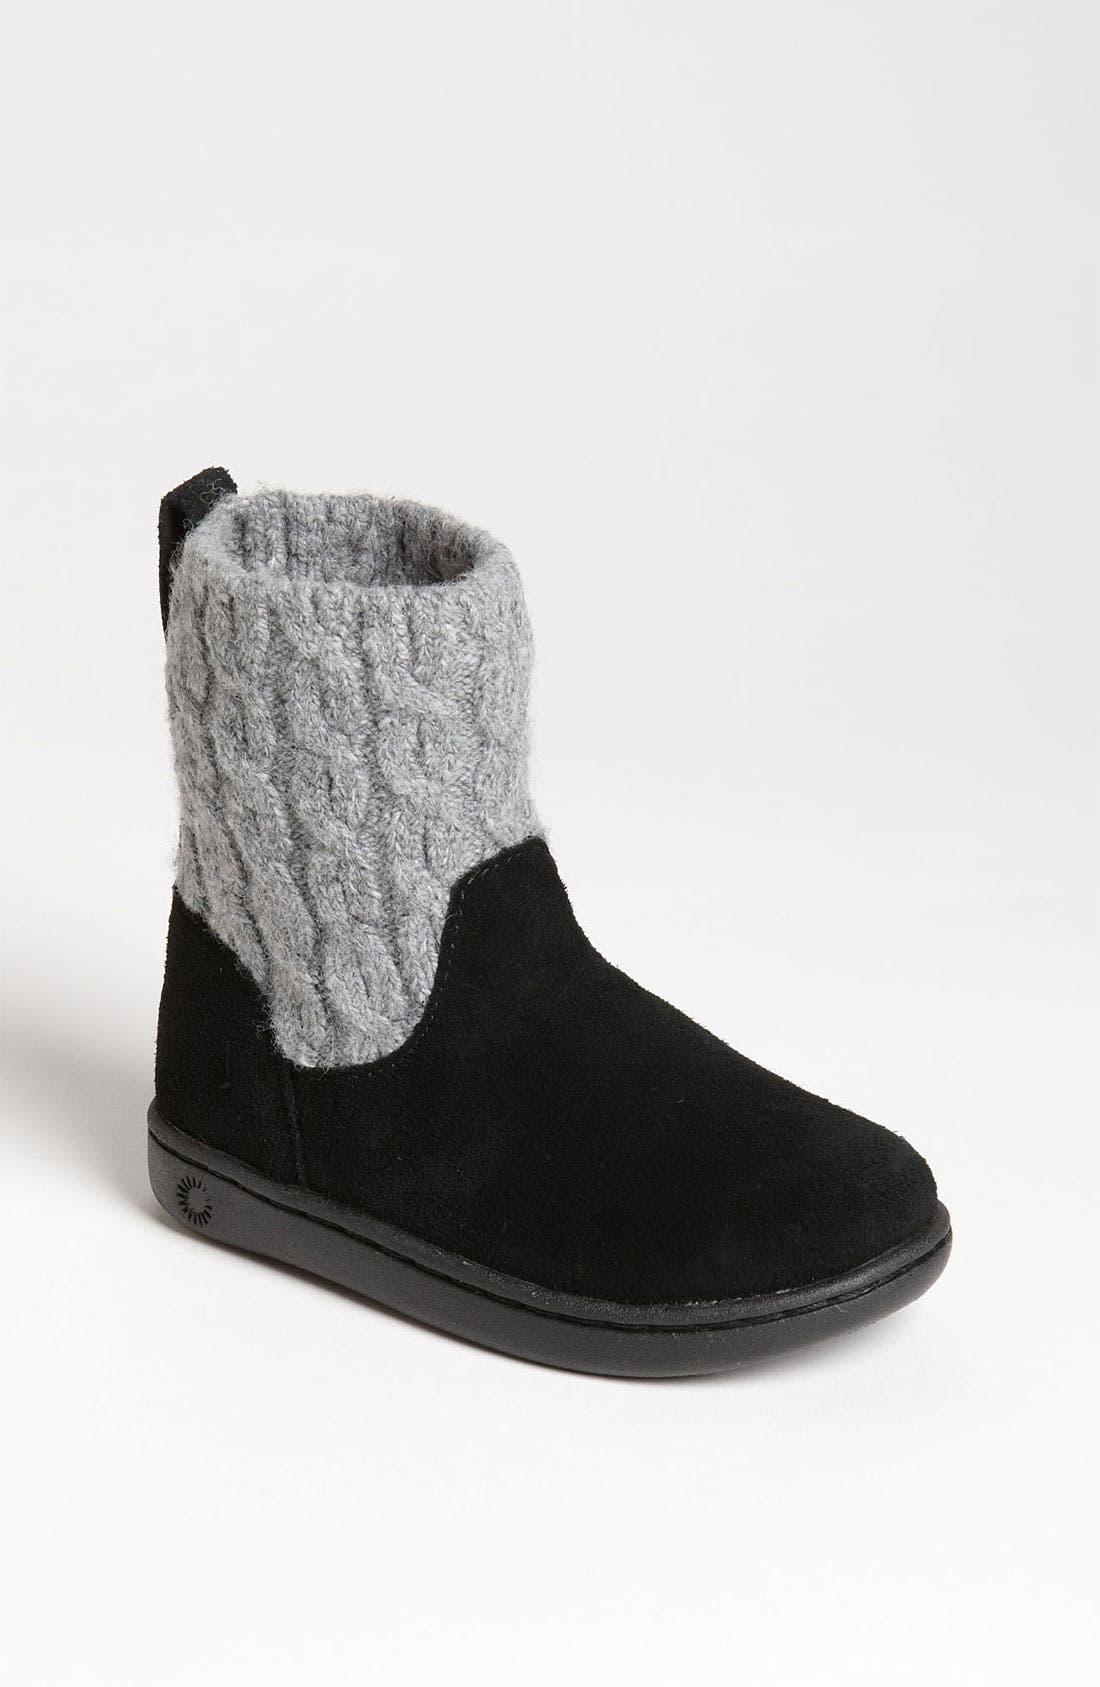 Alternate Image 1 Selected - UGG® Australia 'Carissa' Boot (Walker & Toddler)